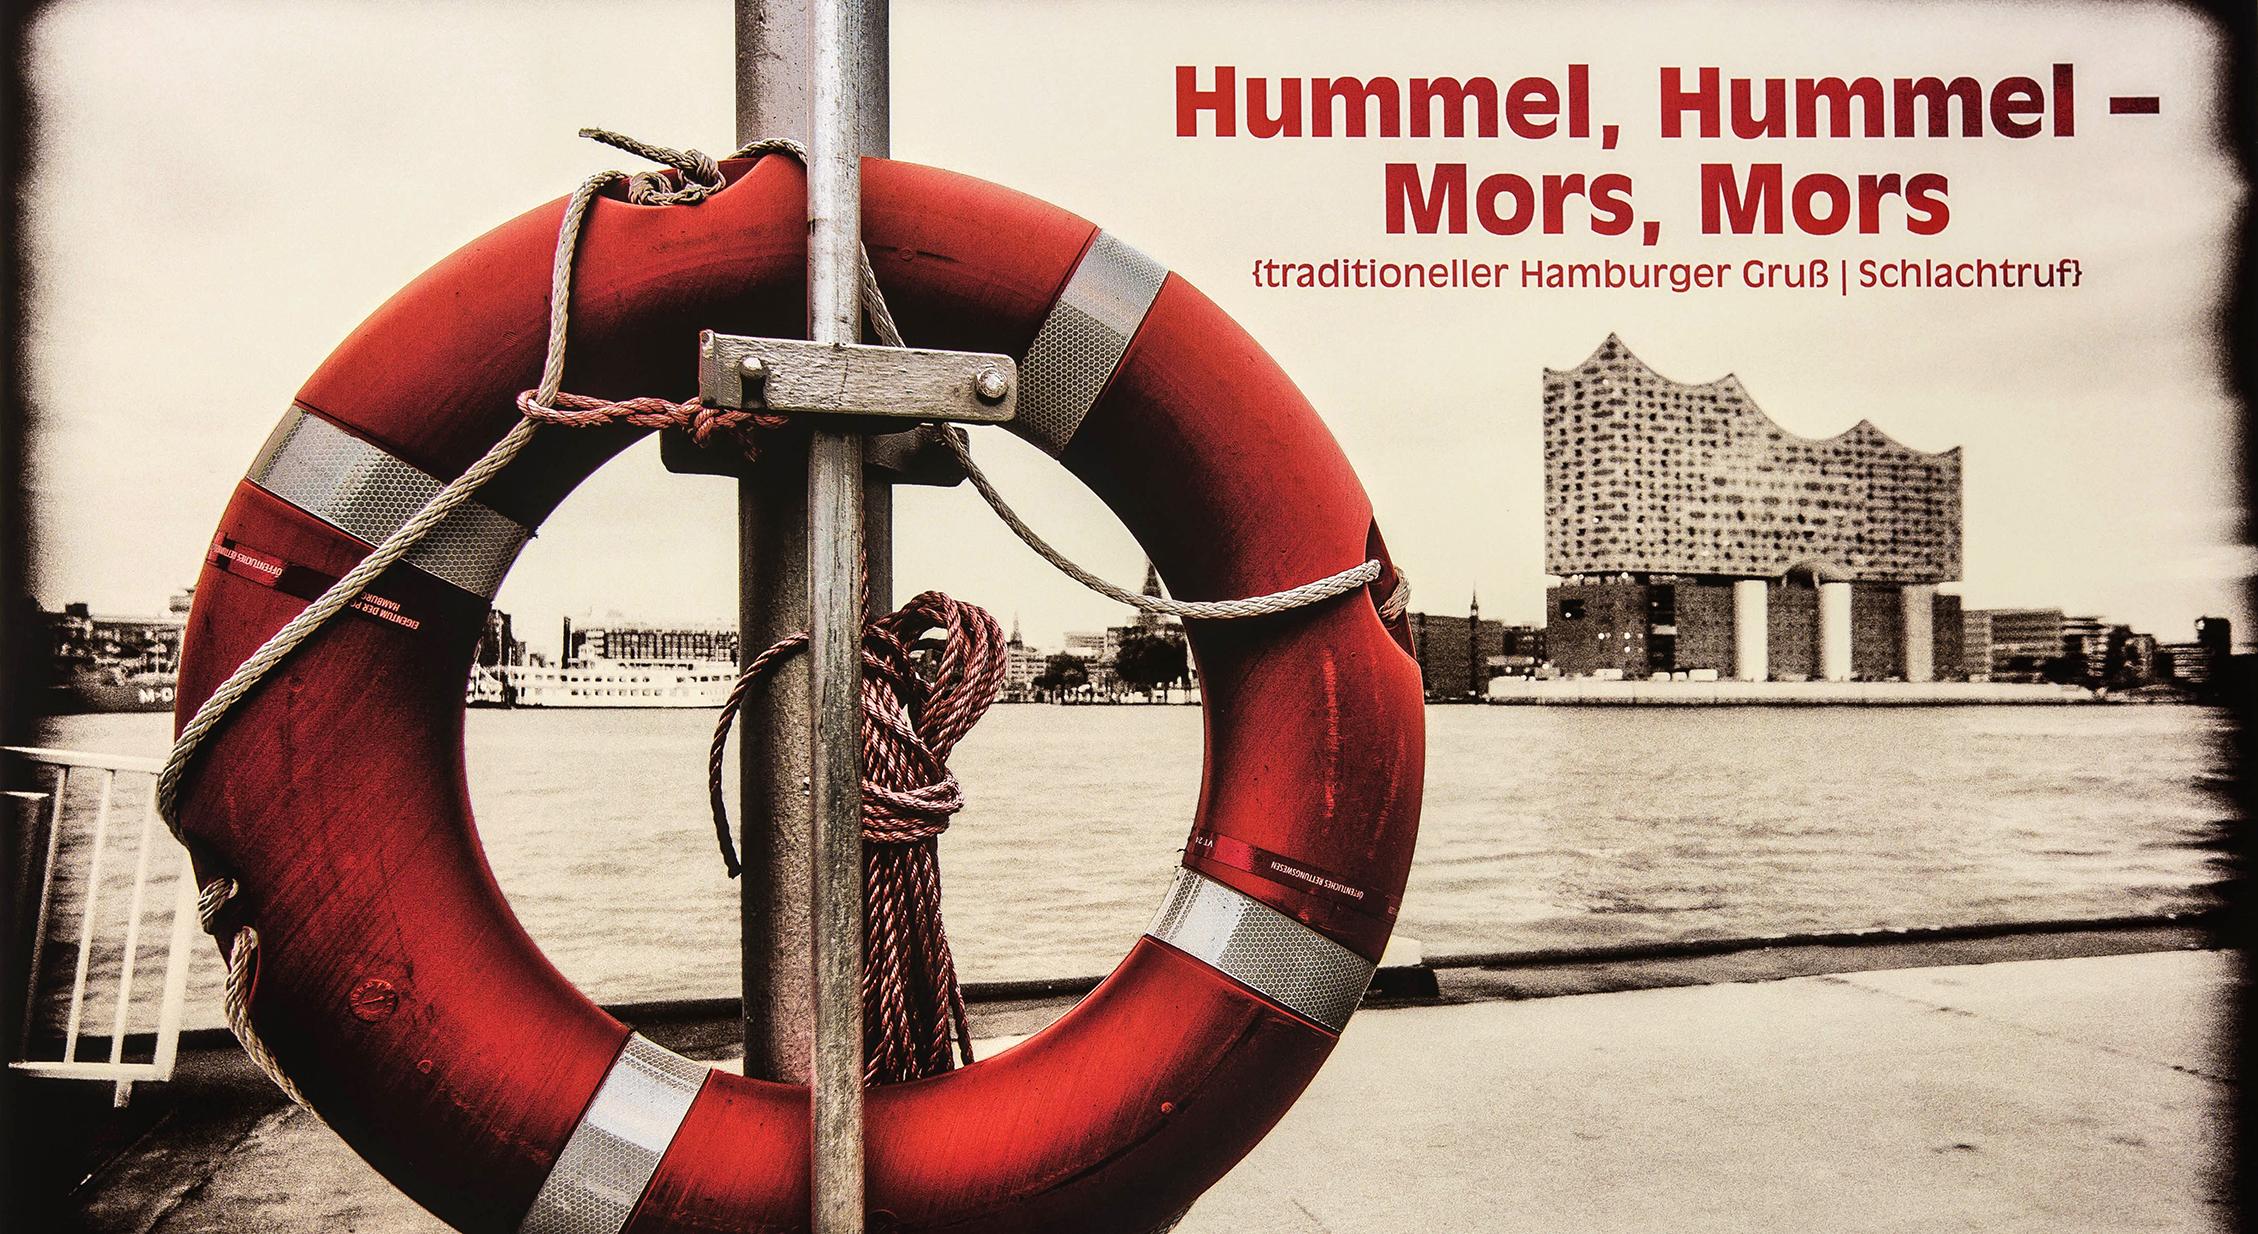 Digitaldruck Hamburg Hummel Hummel Mors Mors Homepage quer small